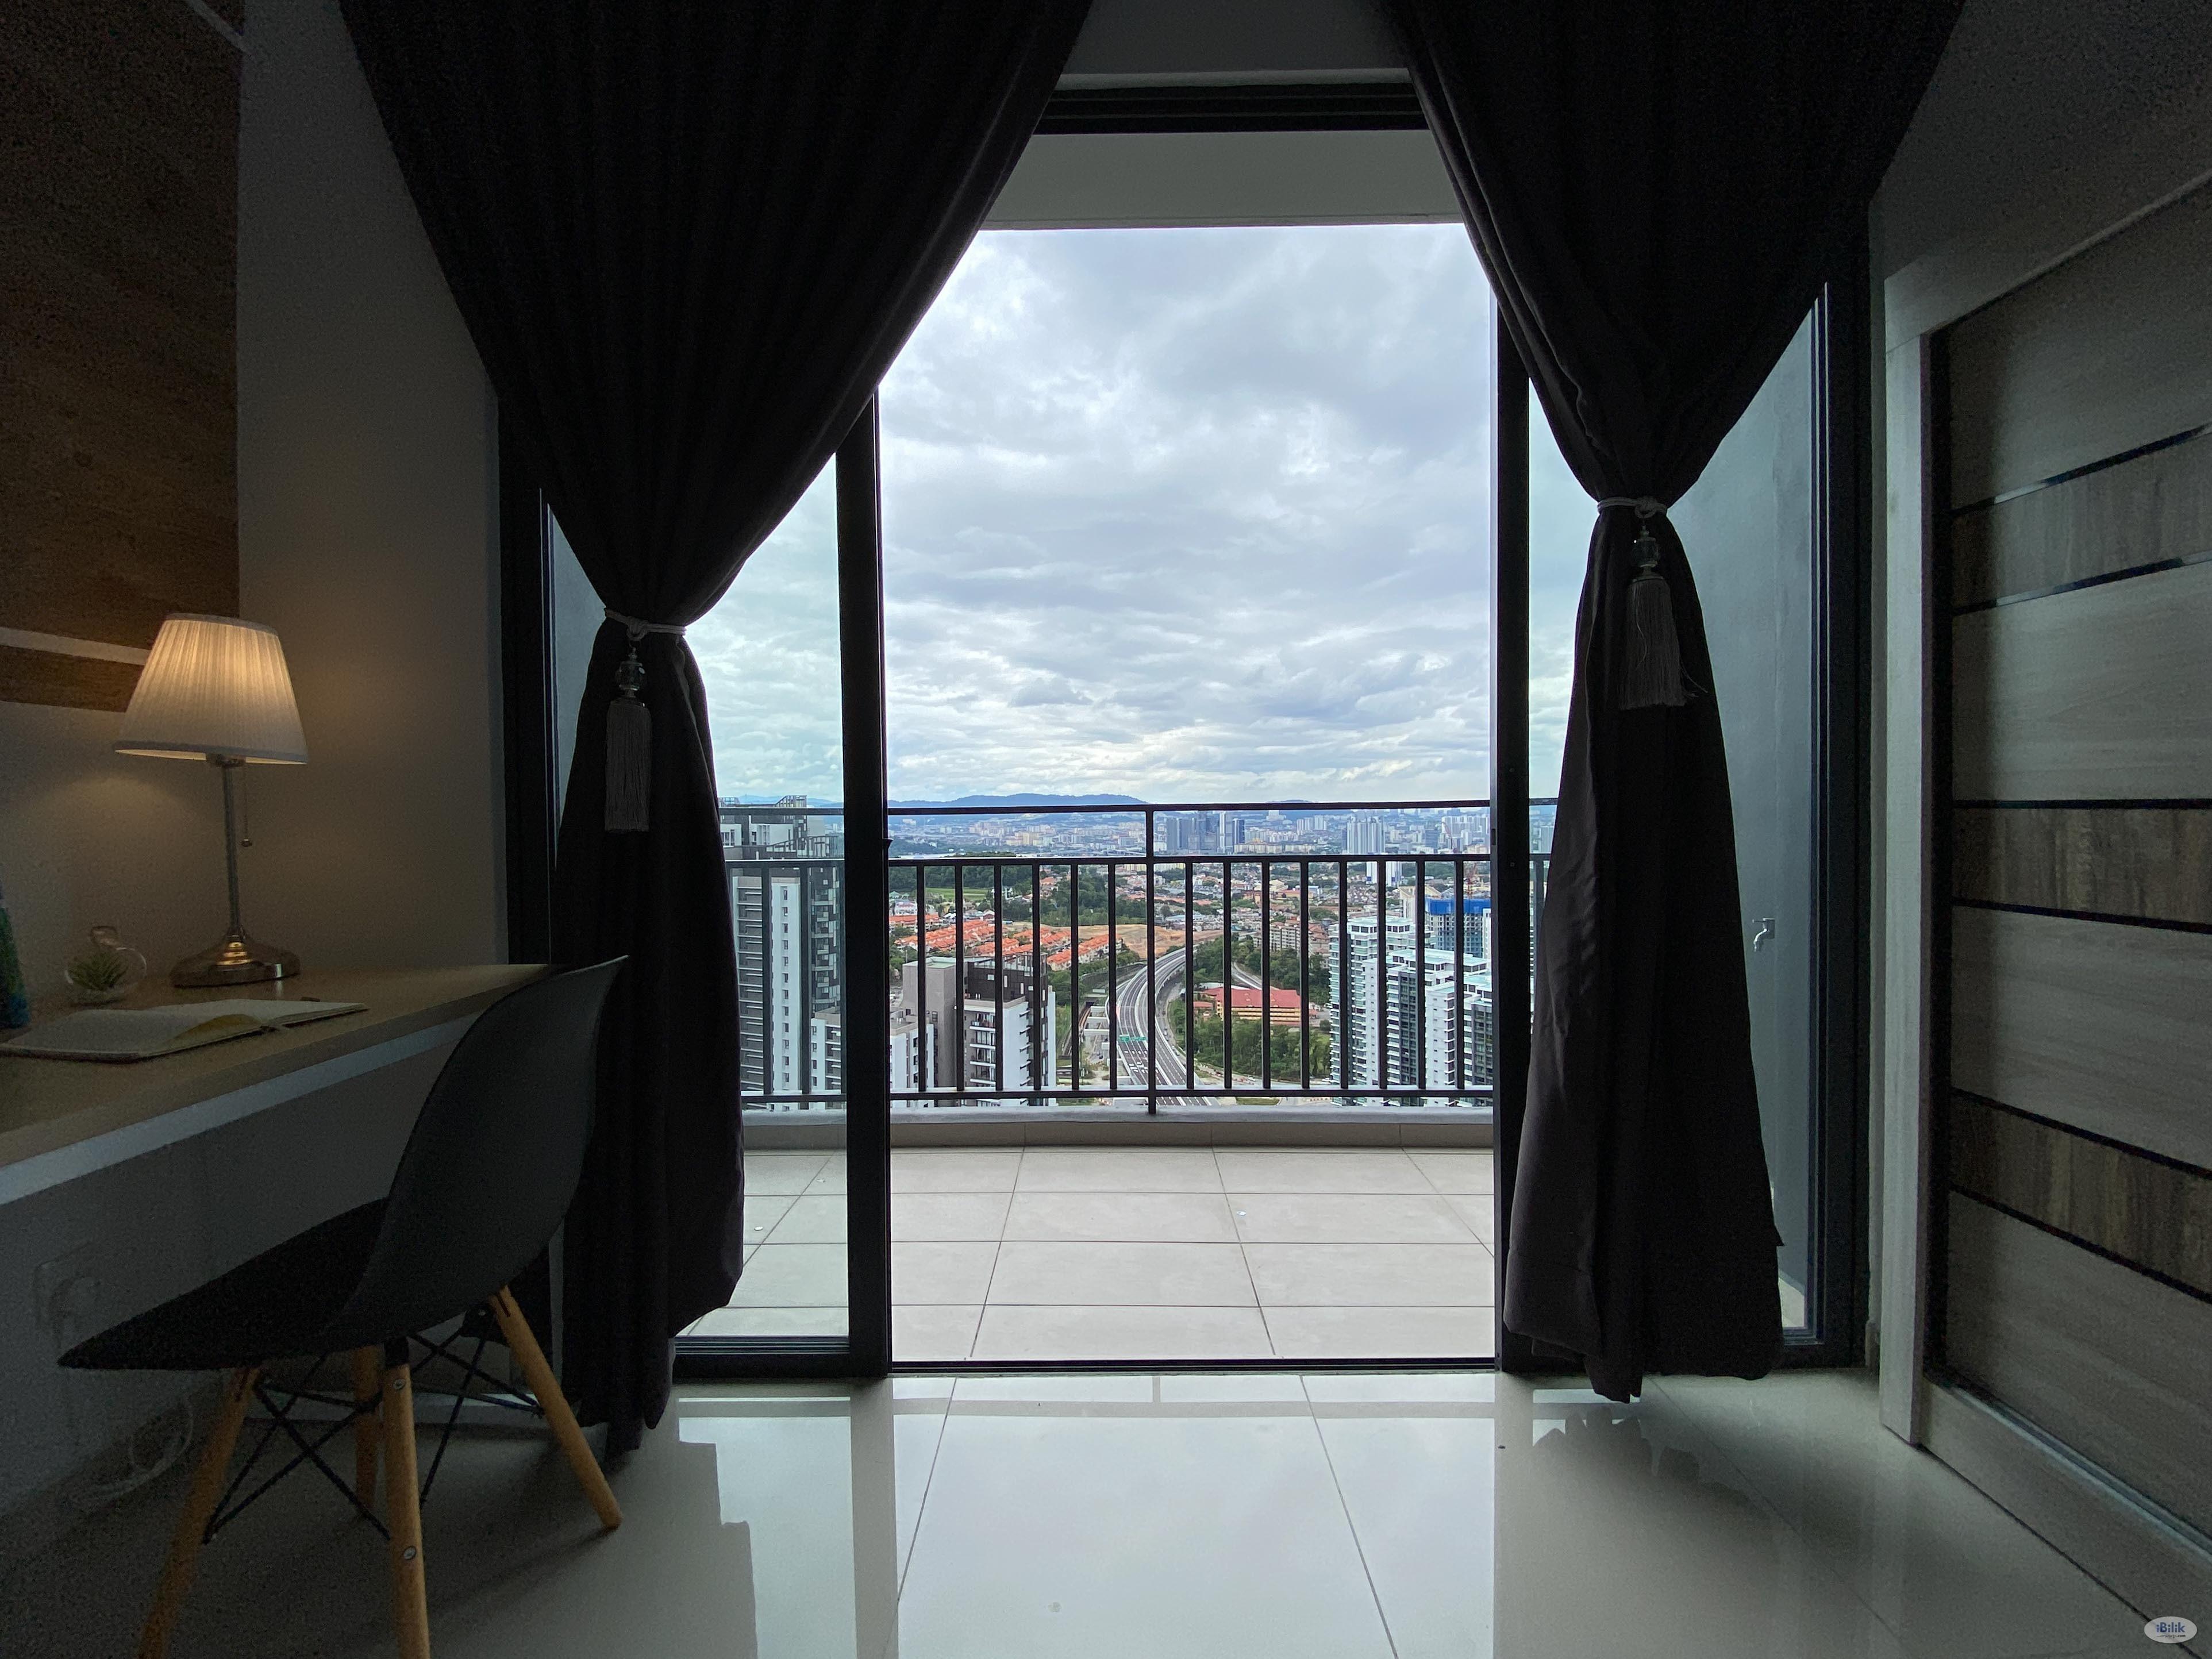 Middle Balcony Room at Wangsa Maju, Setapak